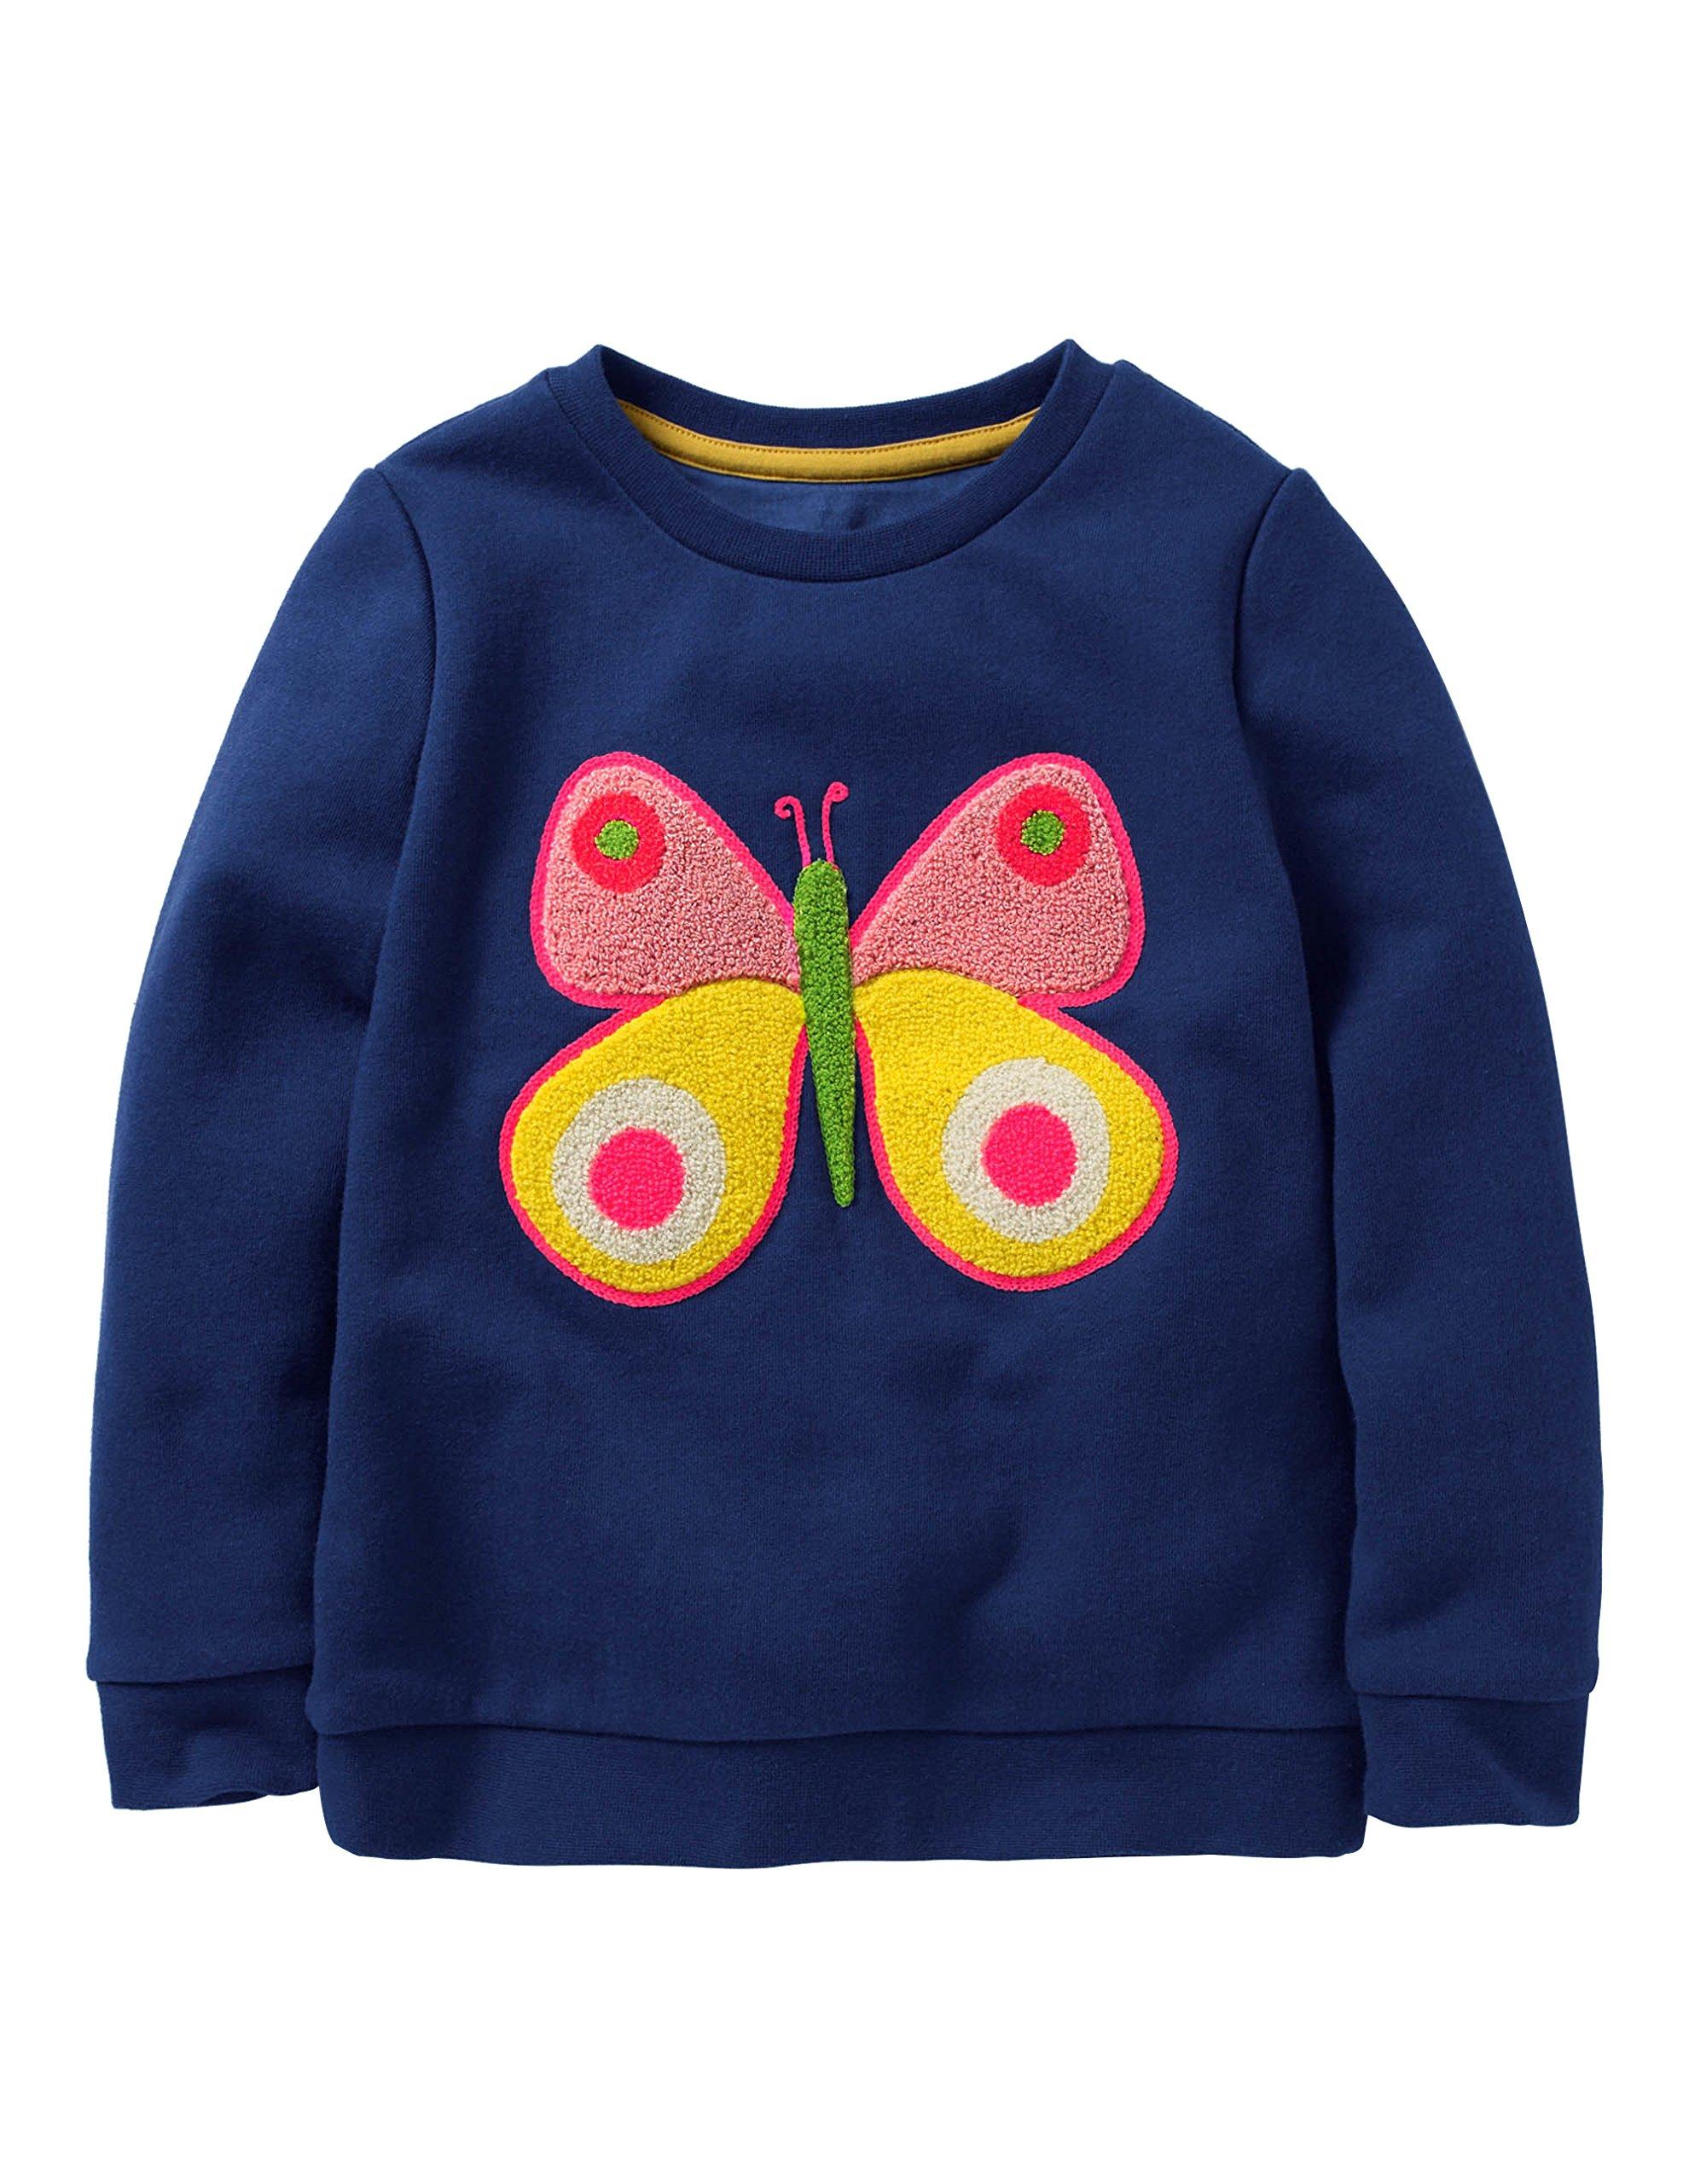 Fiream Girls Cotton Crewneck Cute Embroidery Sweatshirts(120White,4T)